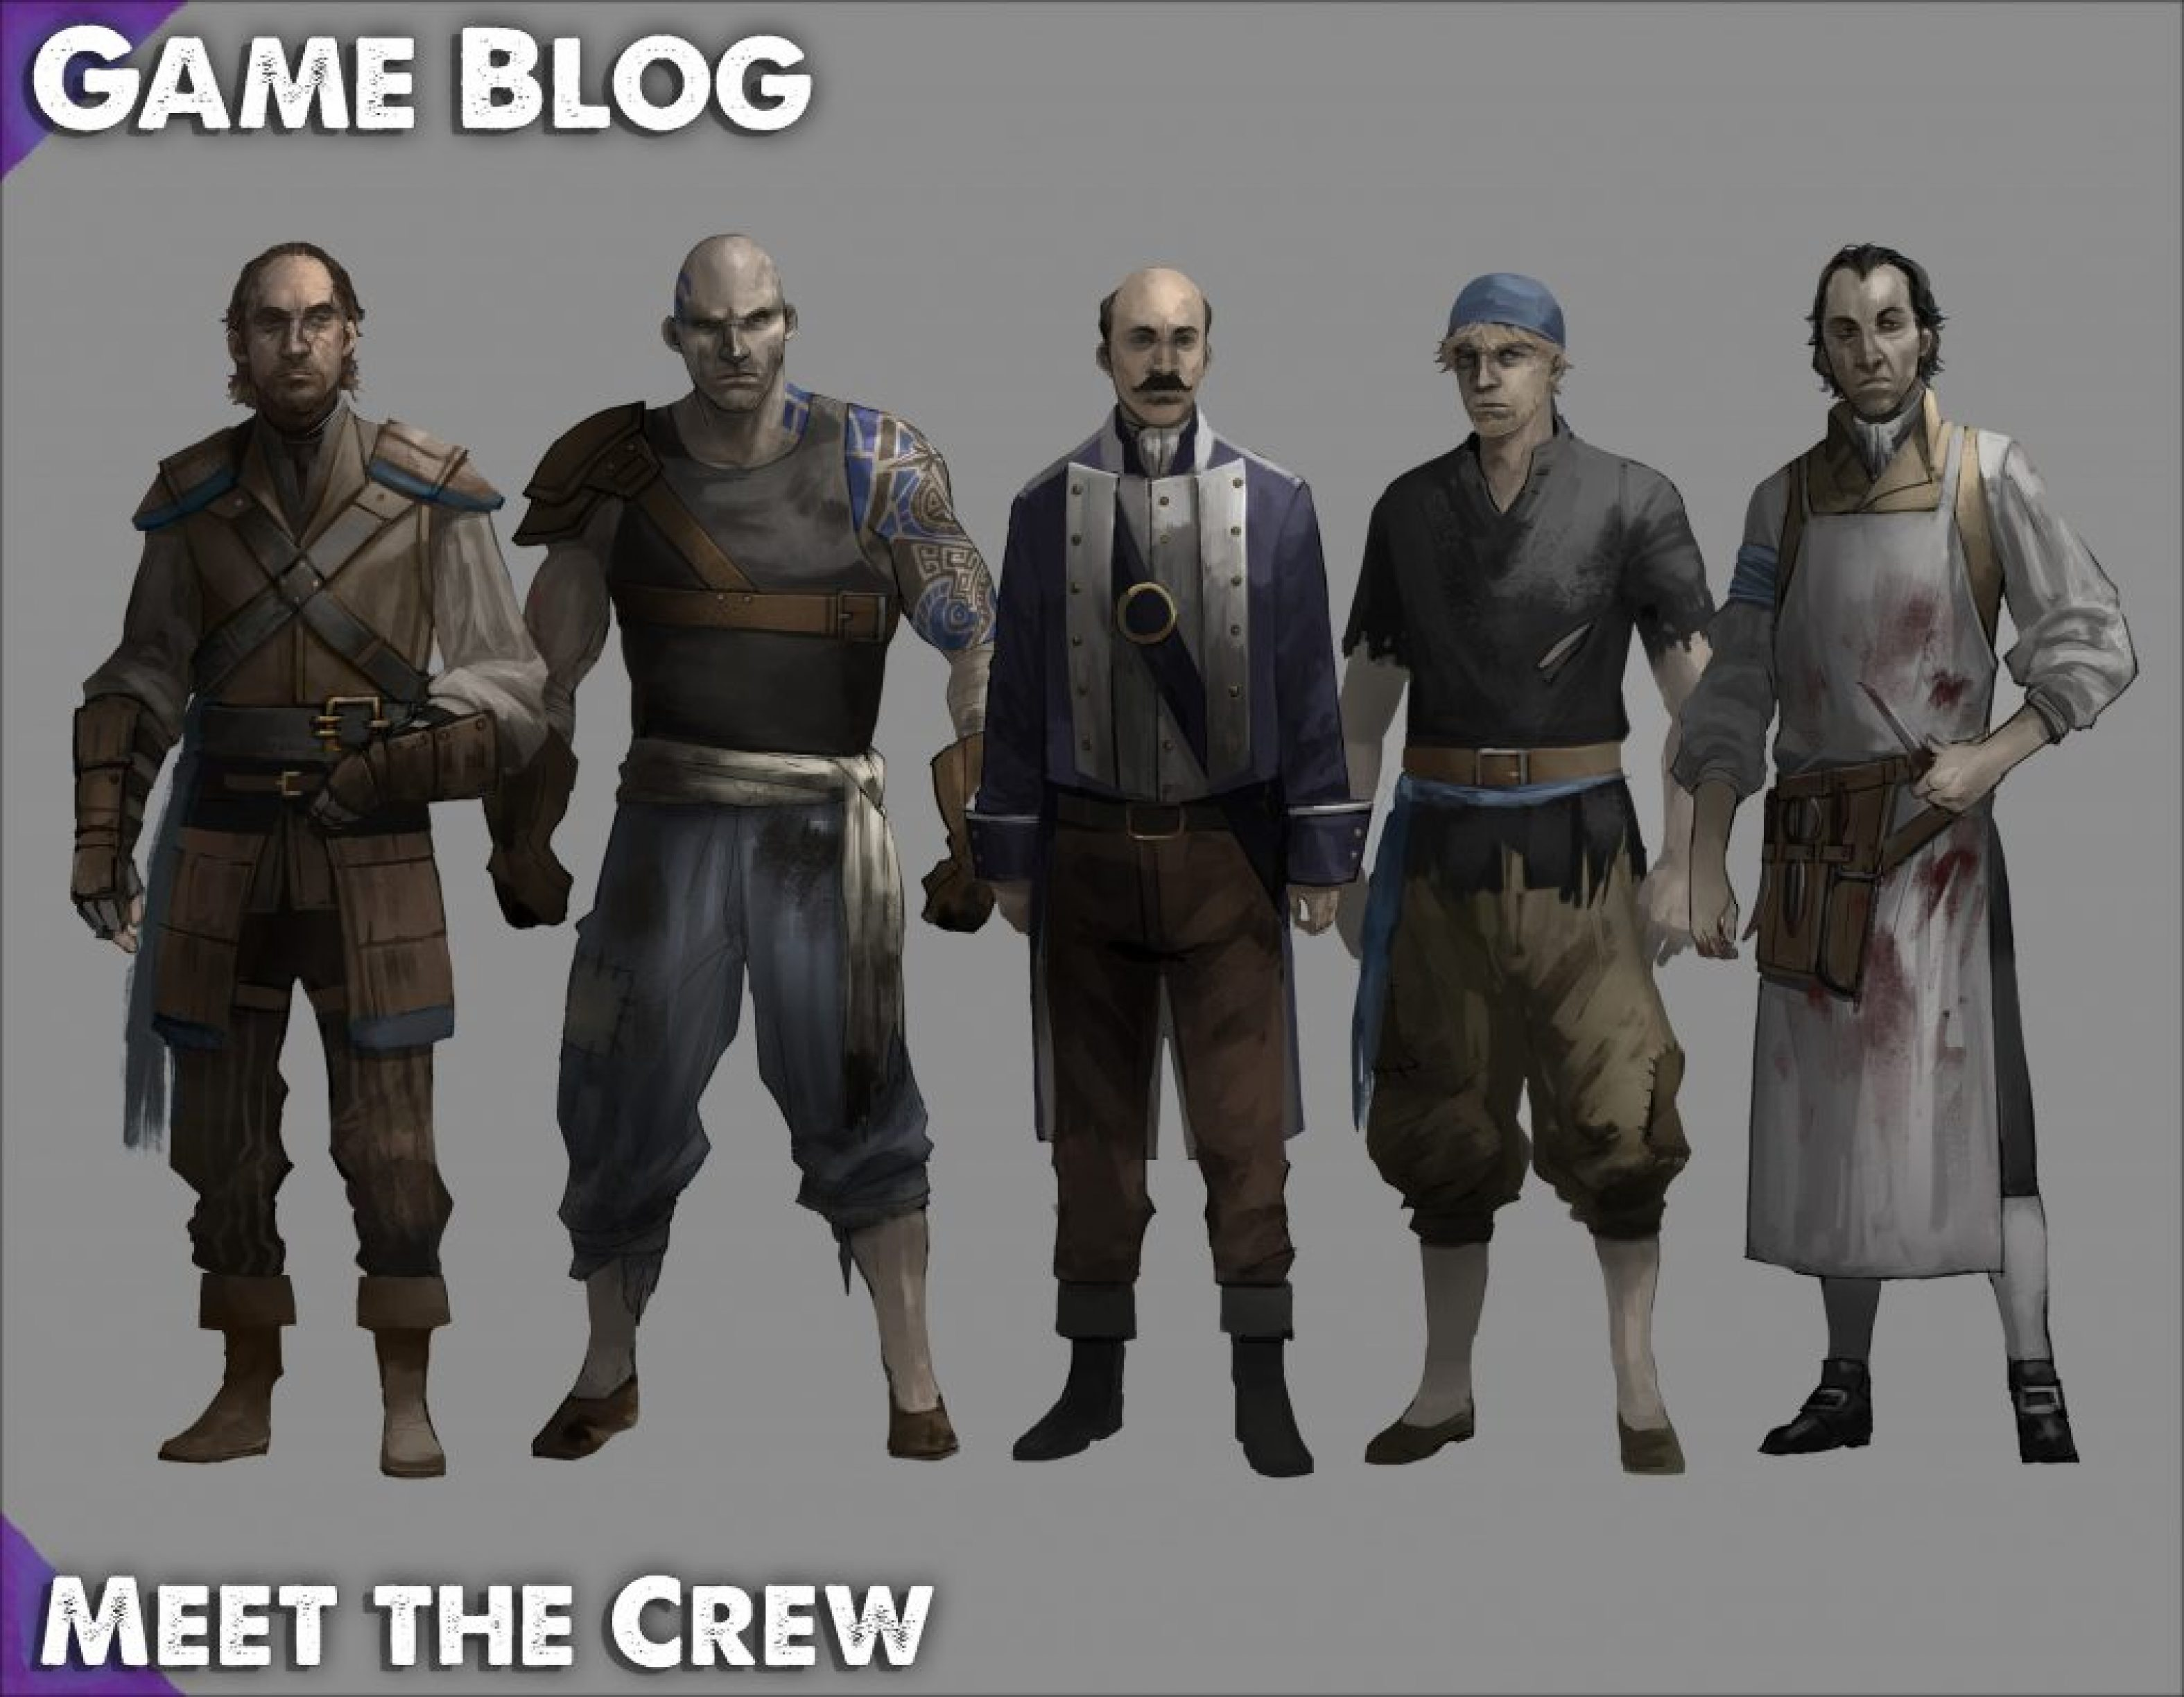 GameBlog_MeetTheCrew_FeaturedImage